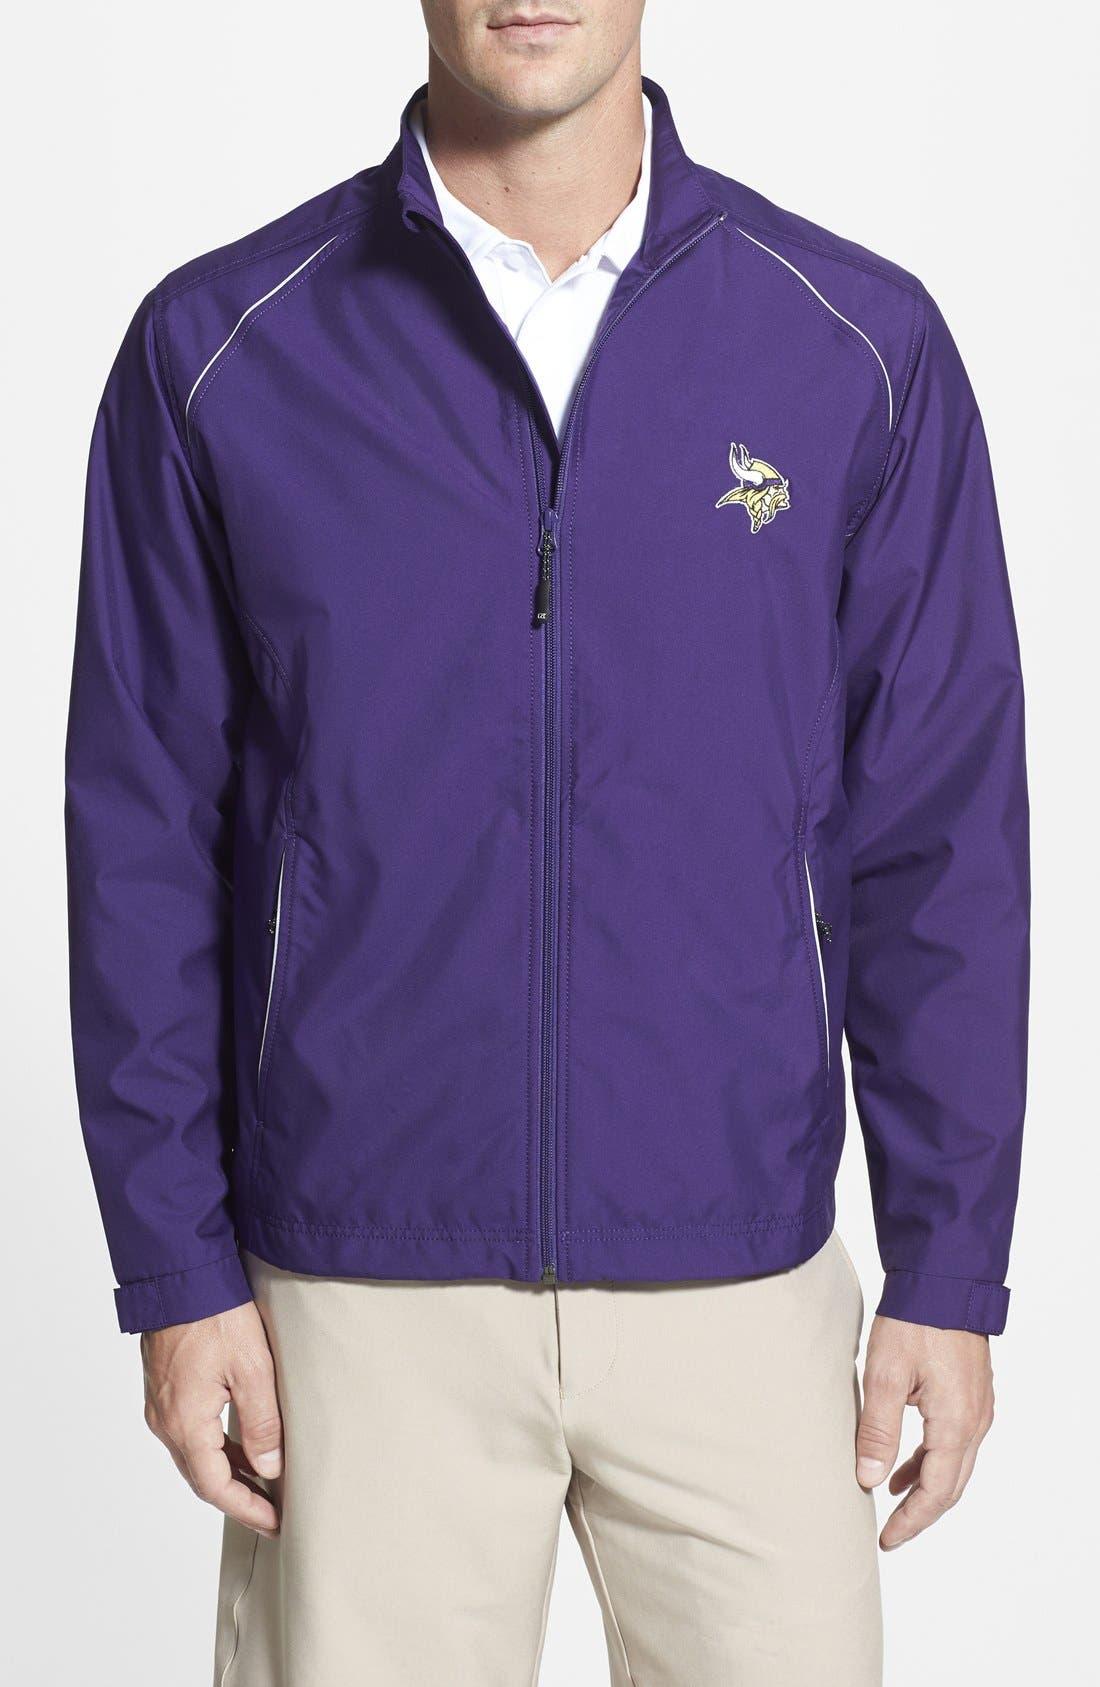 Minnesota Vikings - Beacon WeatherTec Wind & Water Resistant Jacket,                         Main,                         color, College Purple